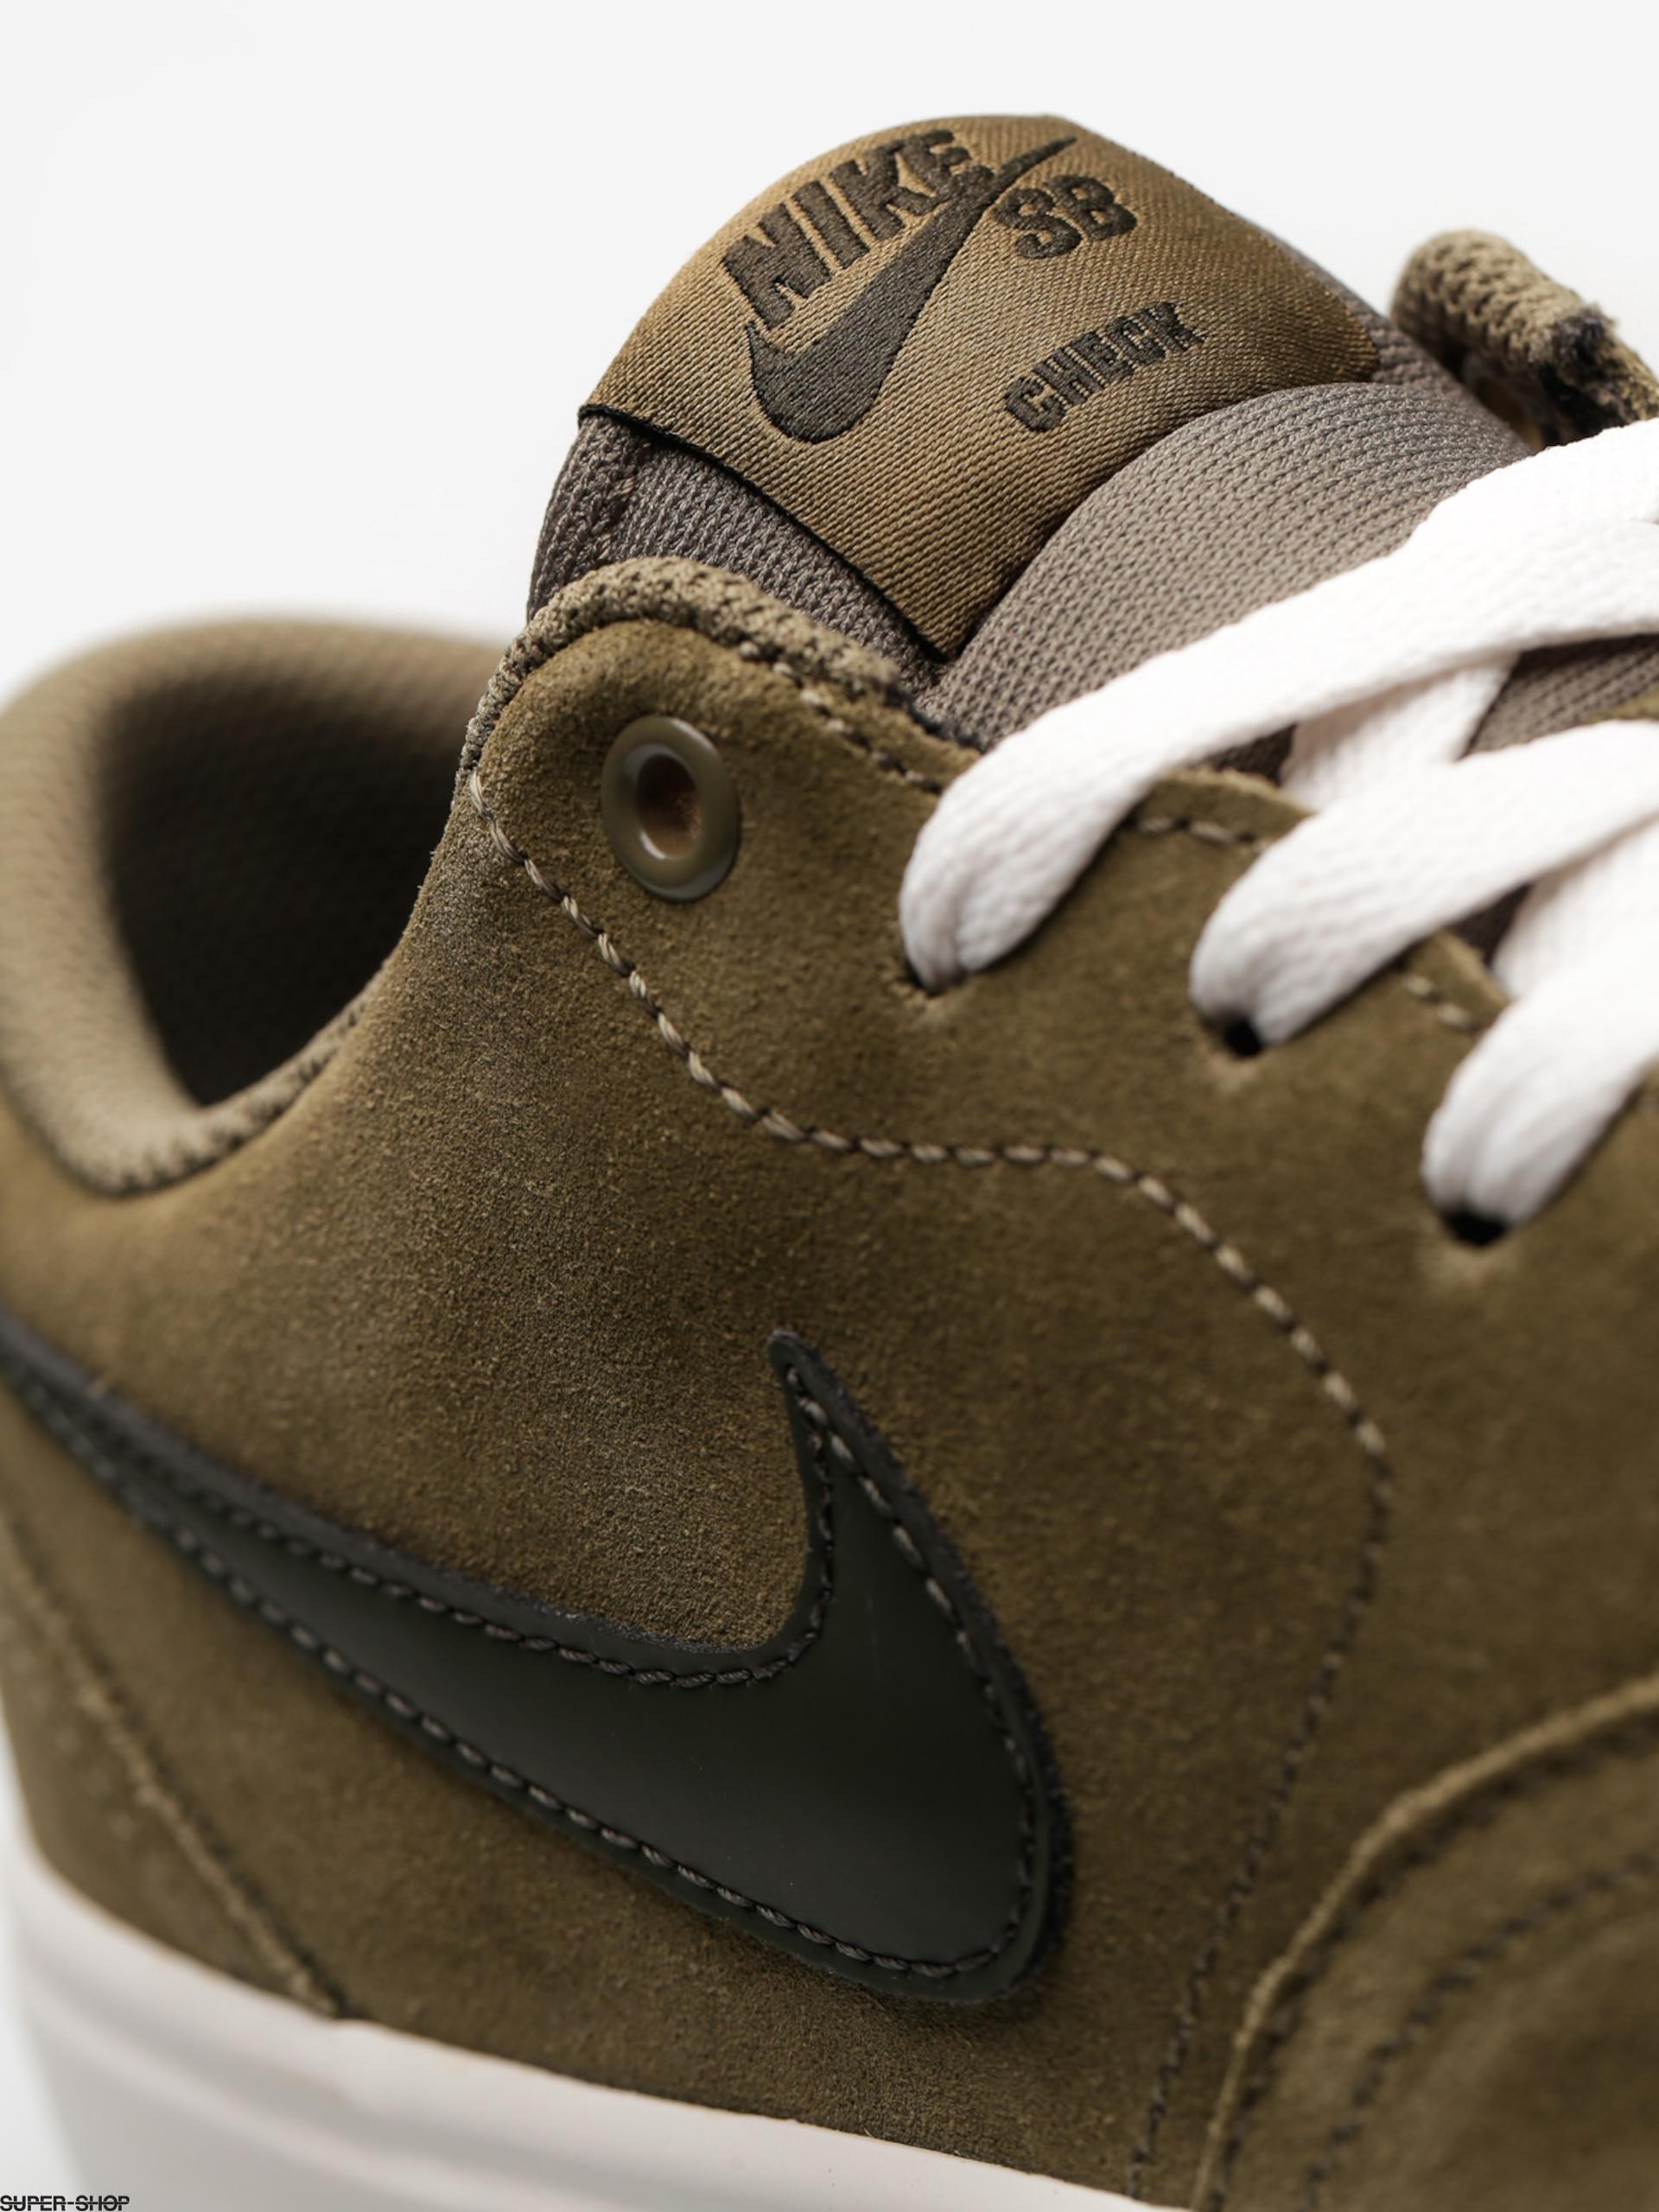 buy popular c1e93 36457 Nike SB Shoes Sb Check Solarsoft (medium olivesequoia summit white black)